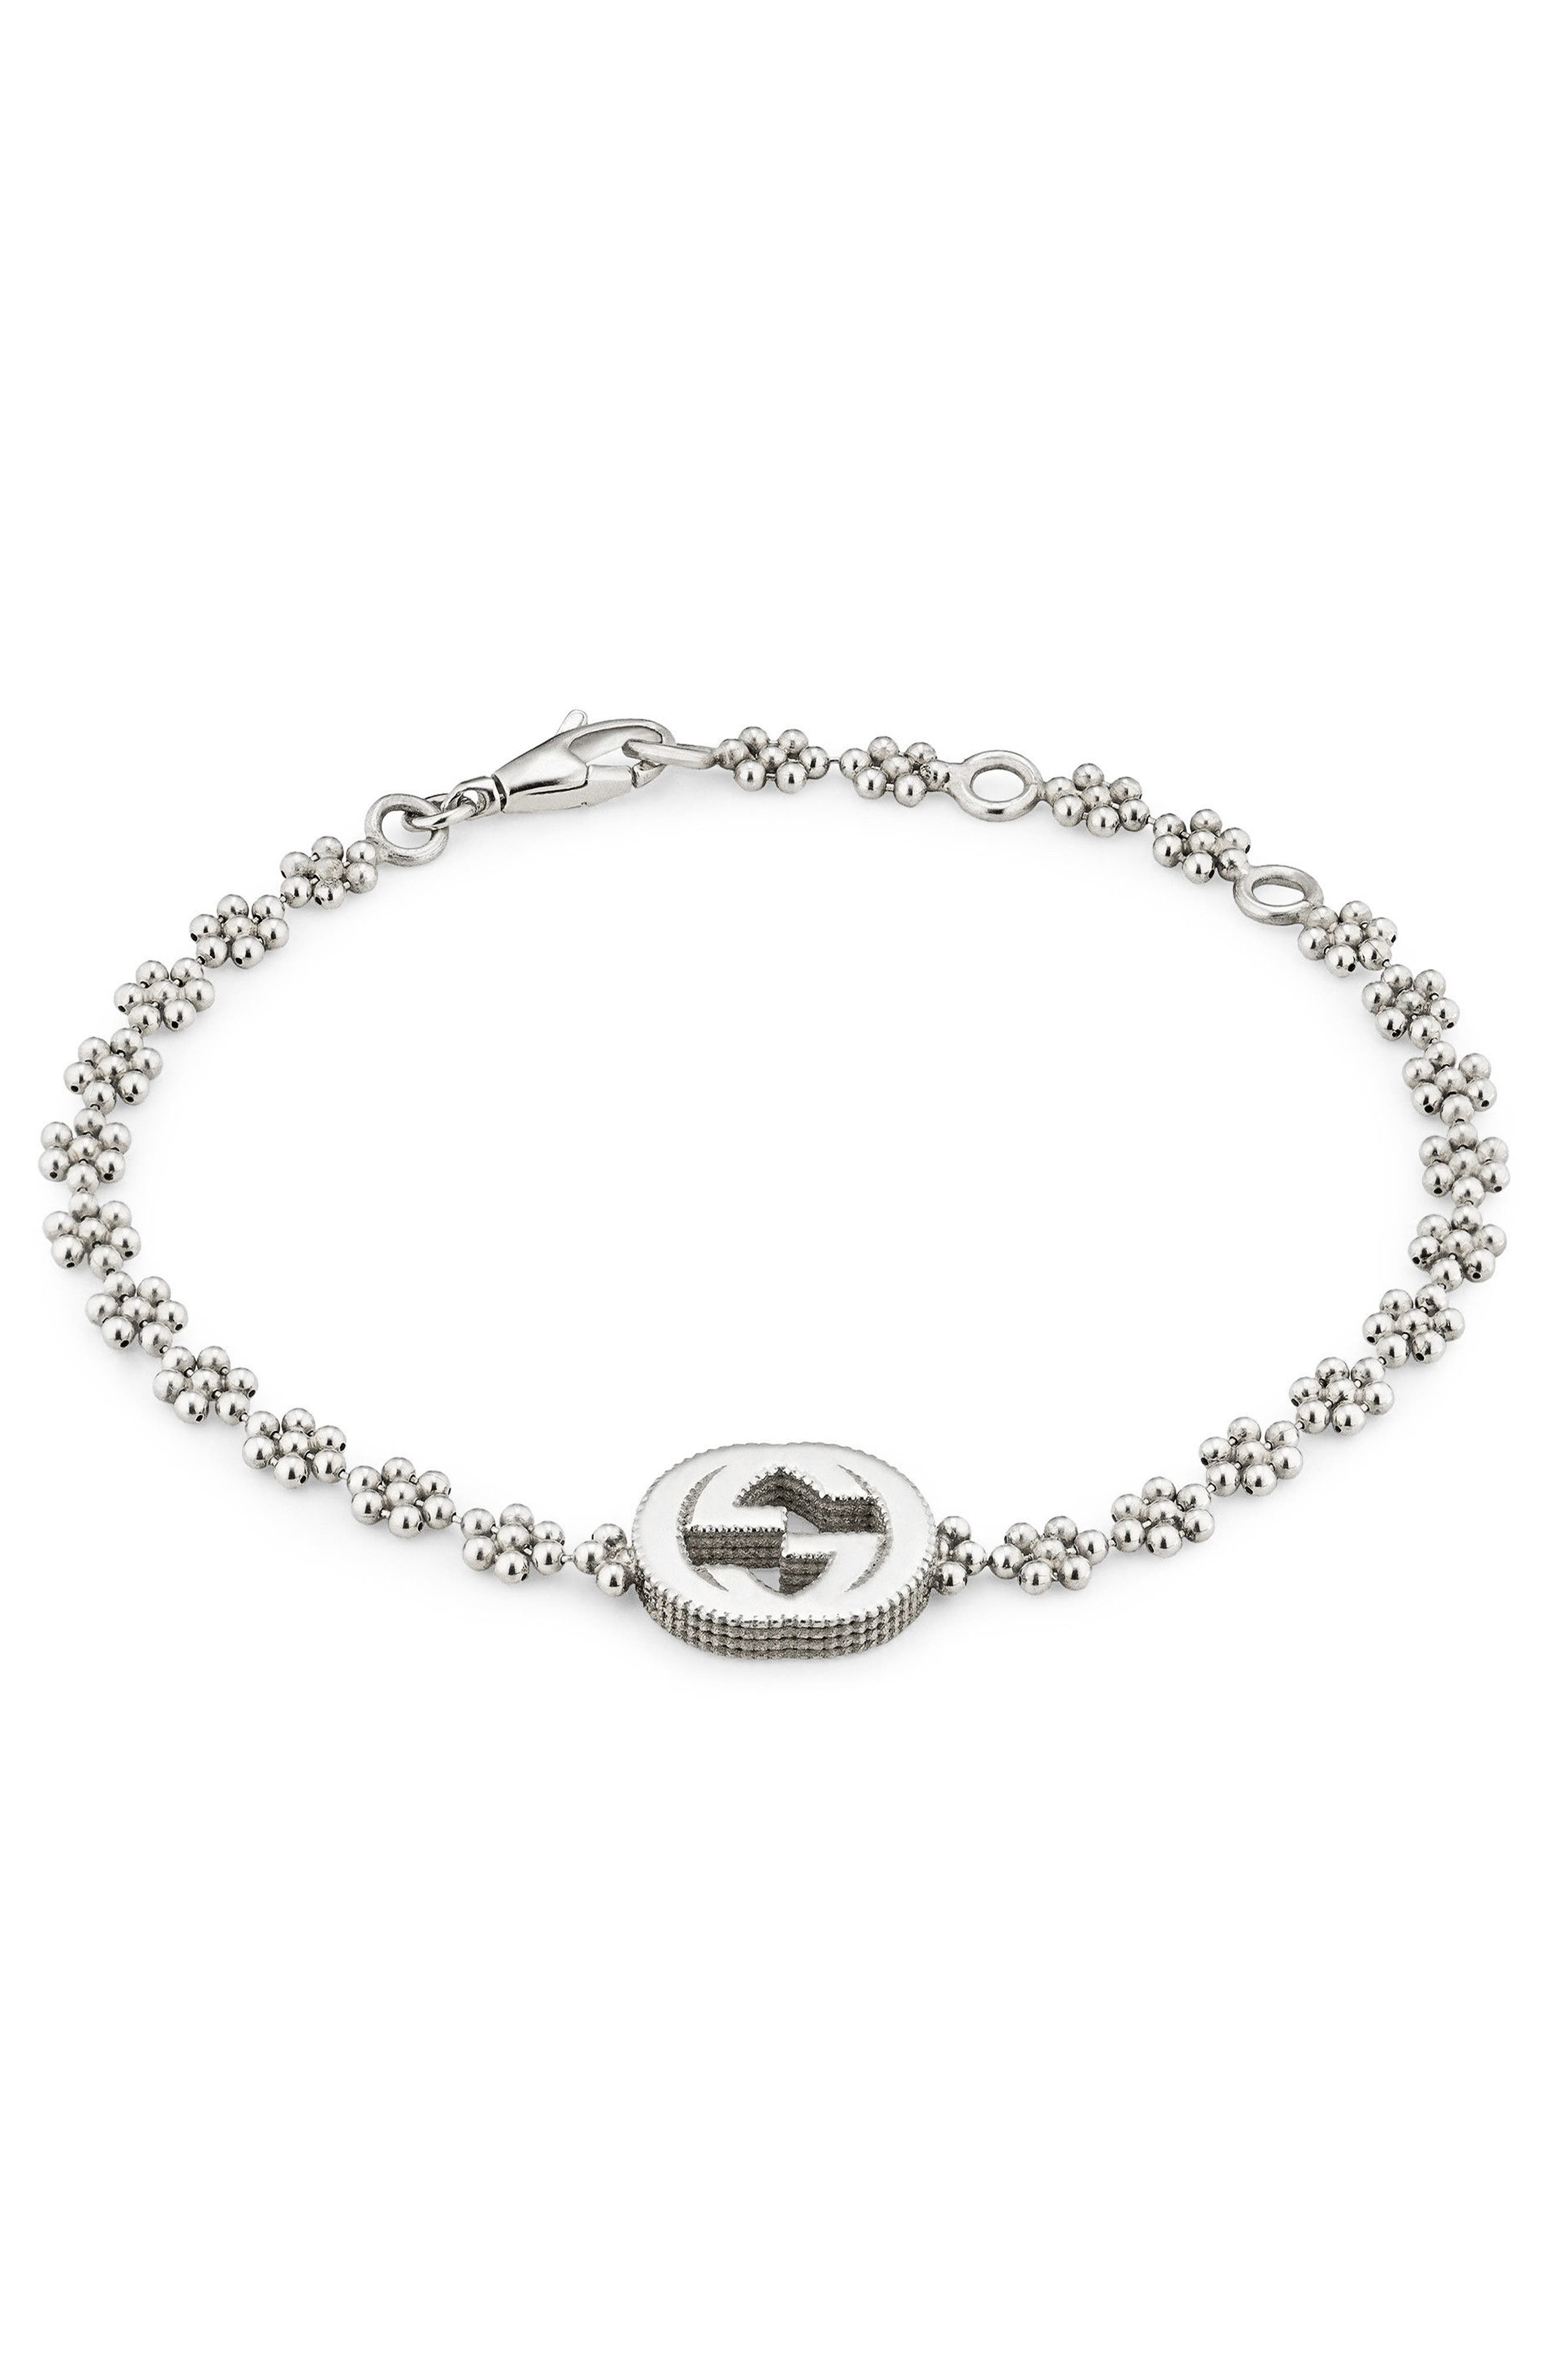 Interlocking-G Bracelet,                             Main thumbnail 1, color,                             Sterling Silver